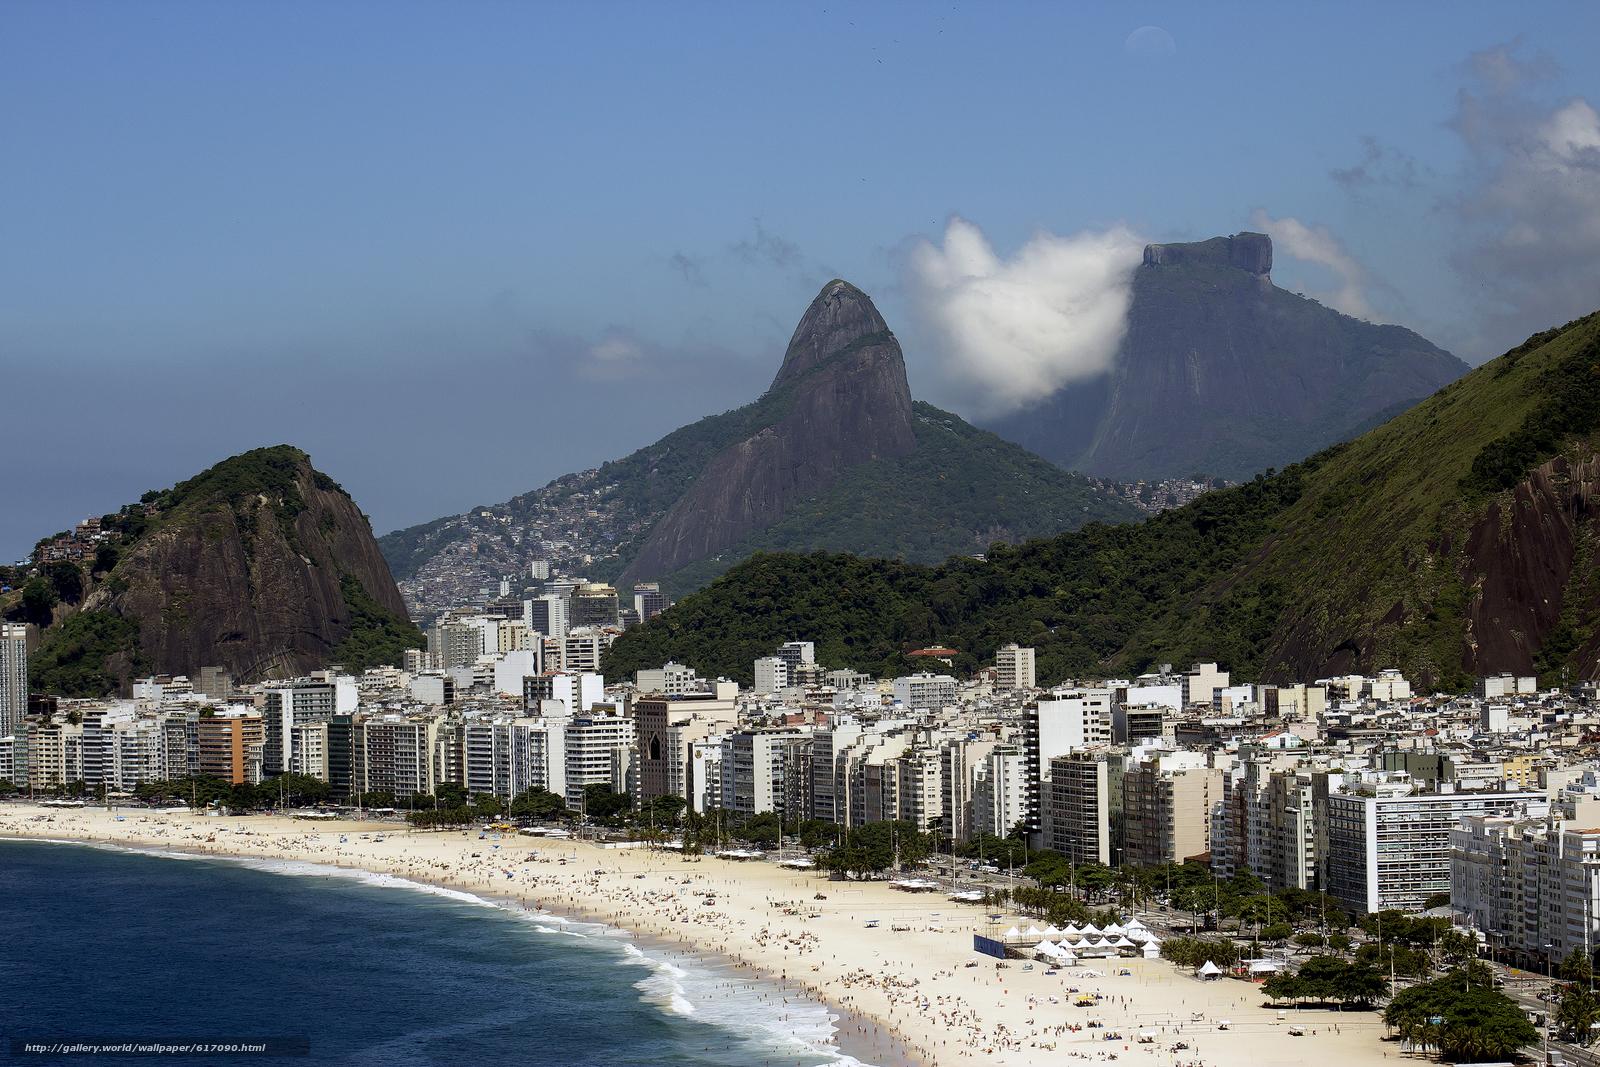 Рио-де-Жанейро, Бразилия, город, горы, море